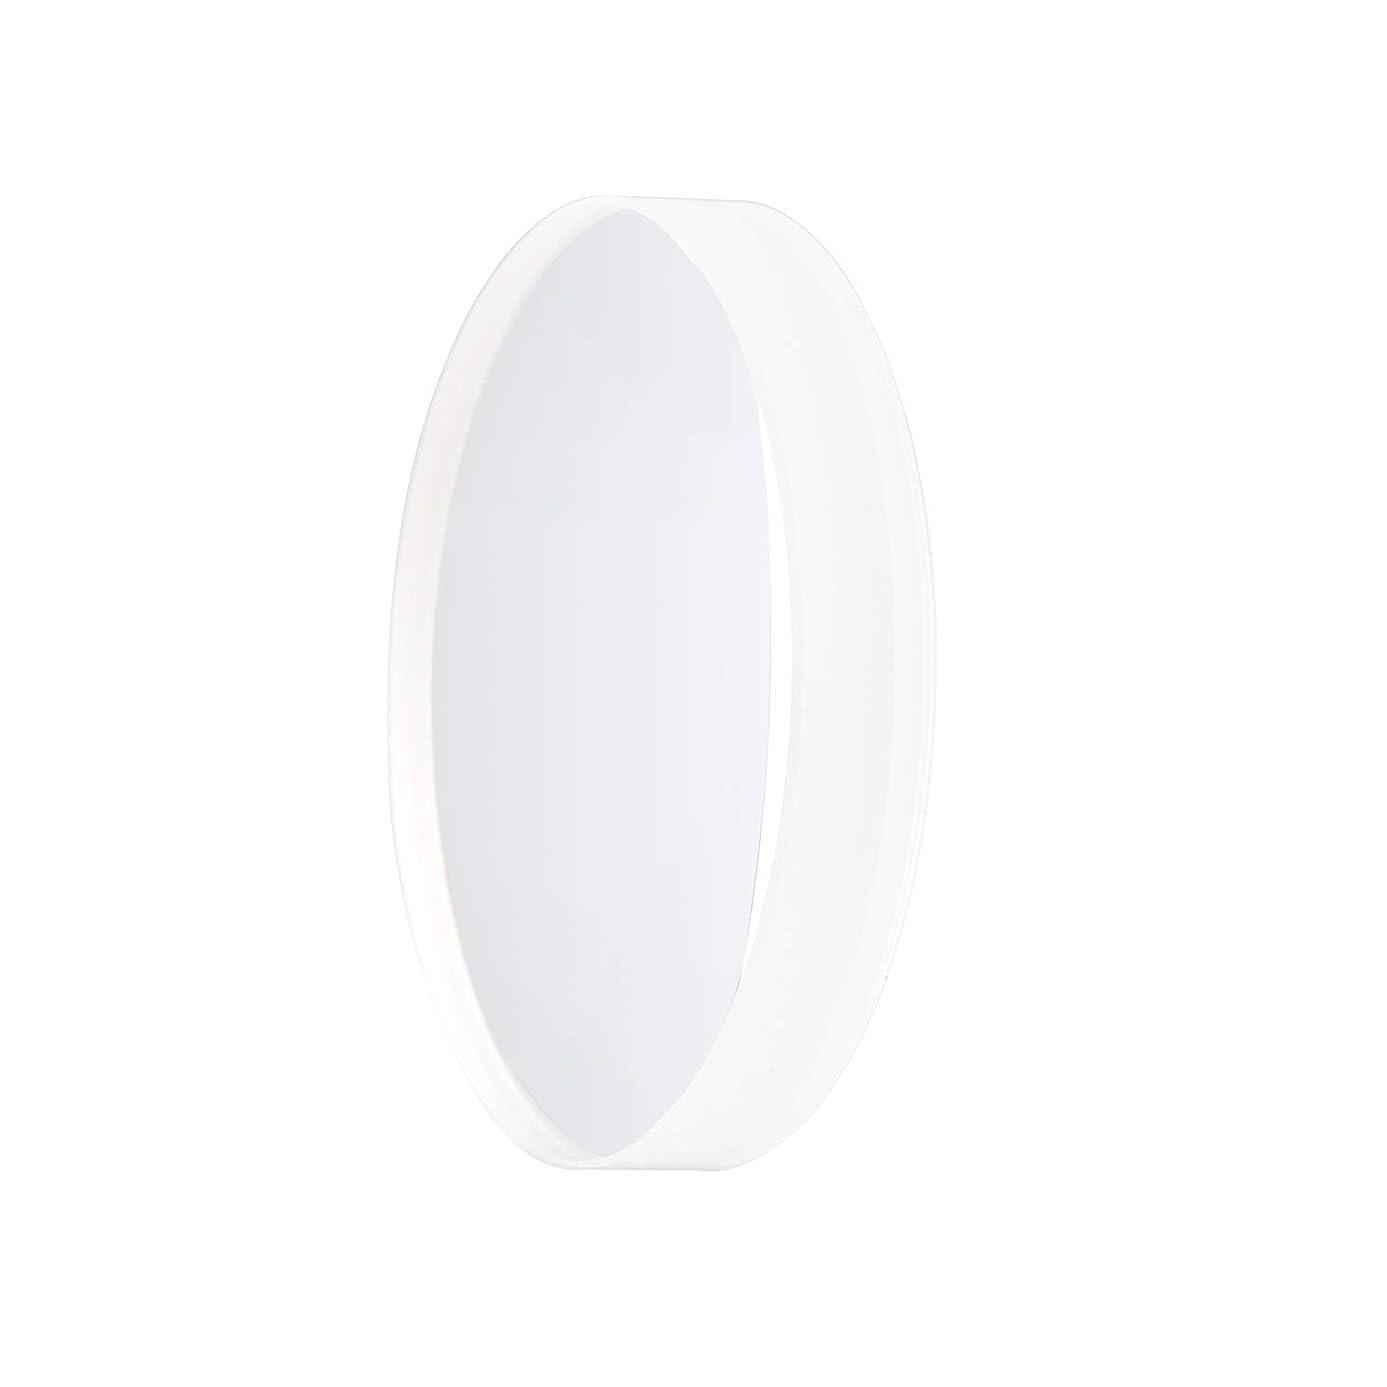 TEN-HIGH Fiber Focusing Lens Dia 28mm, JGS1 Quartz collimating Lens for Fiber Laser Cutting/Welding Machines, FL: 100mm